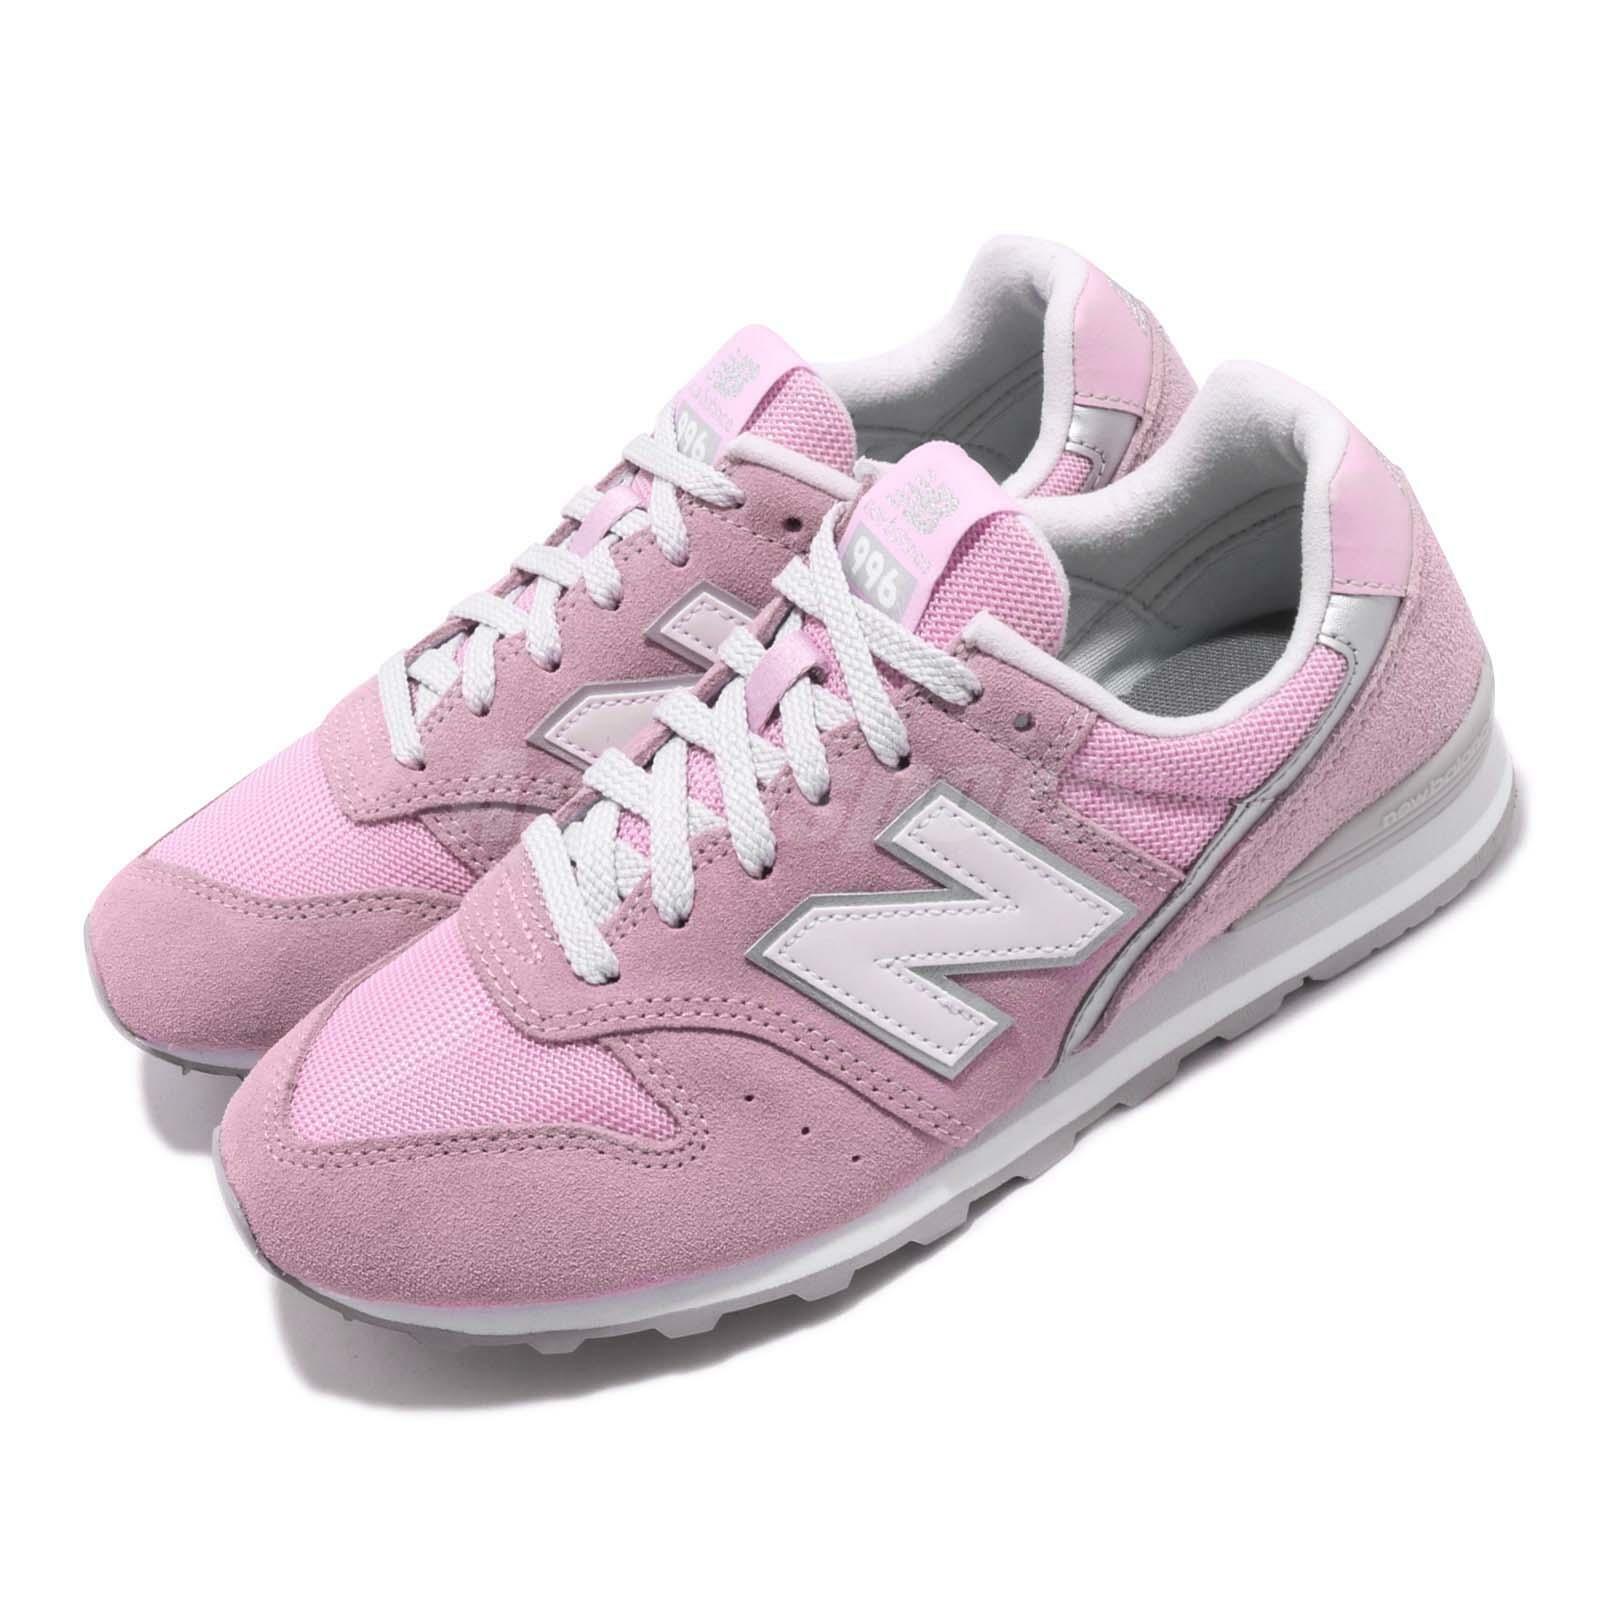 Nuovo equilibrio WL96CLA  D Donna bianca bianca bianca bianca bianca bianca bianca bianca Scarpe scarpe da ginnastica WLA96CLDD  negozio d'offerta